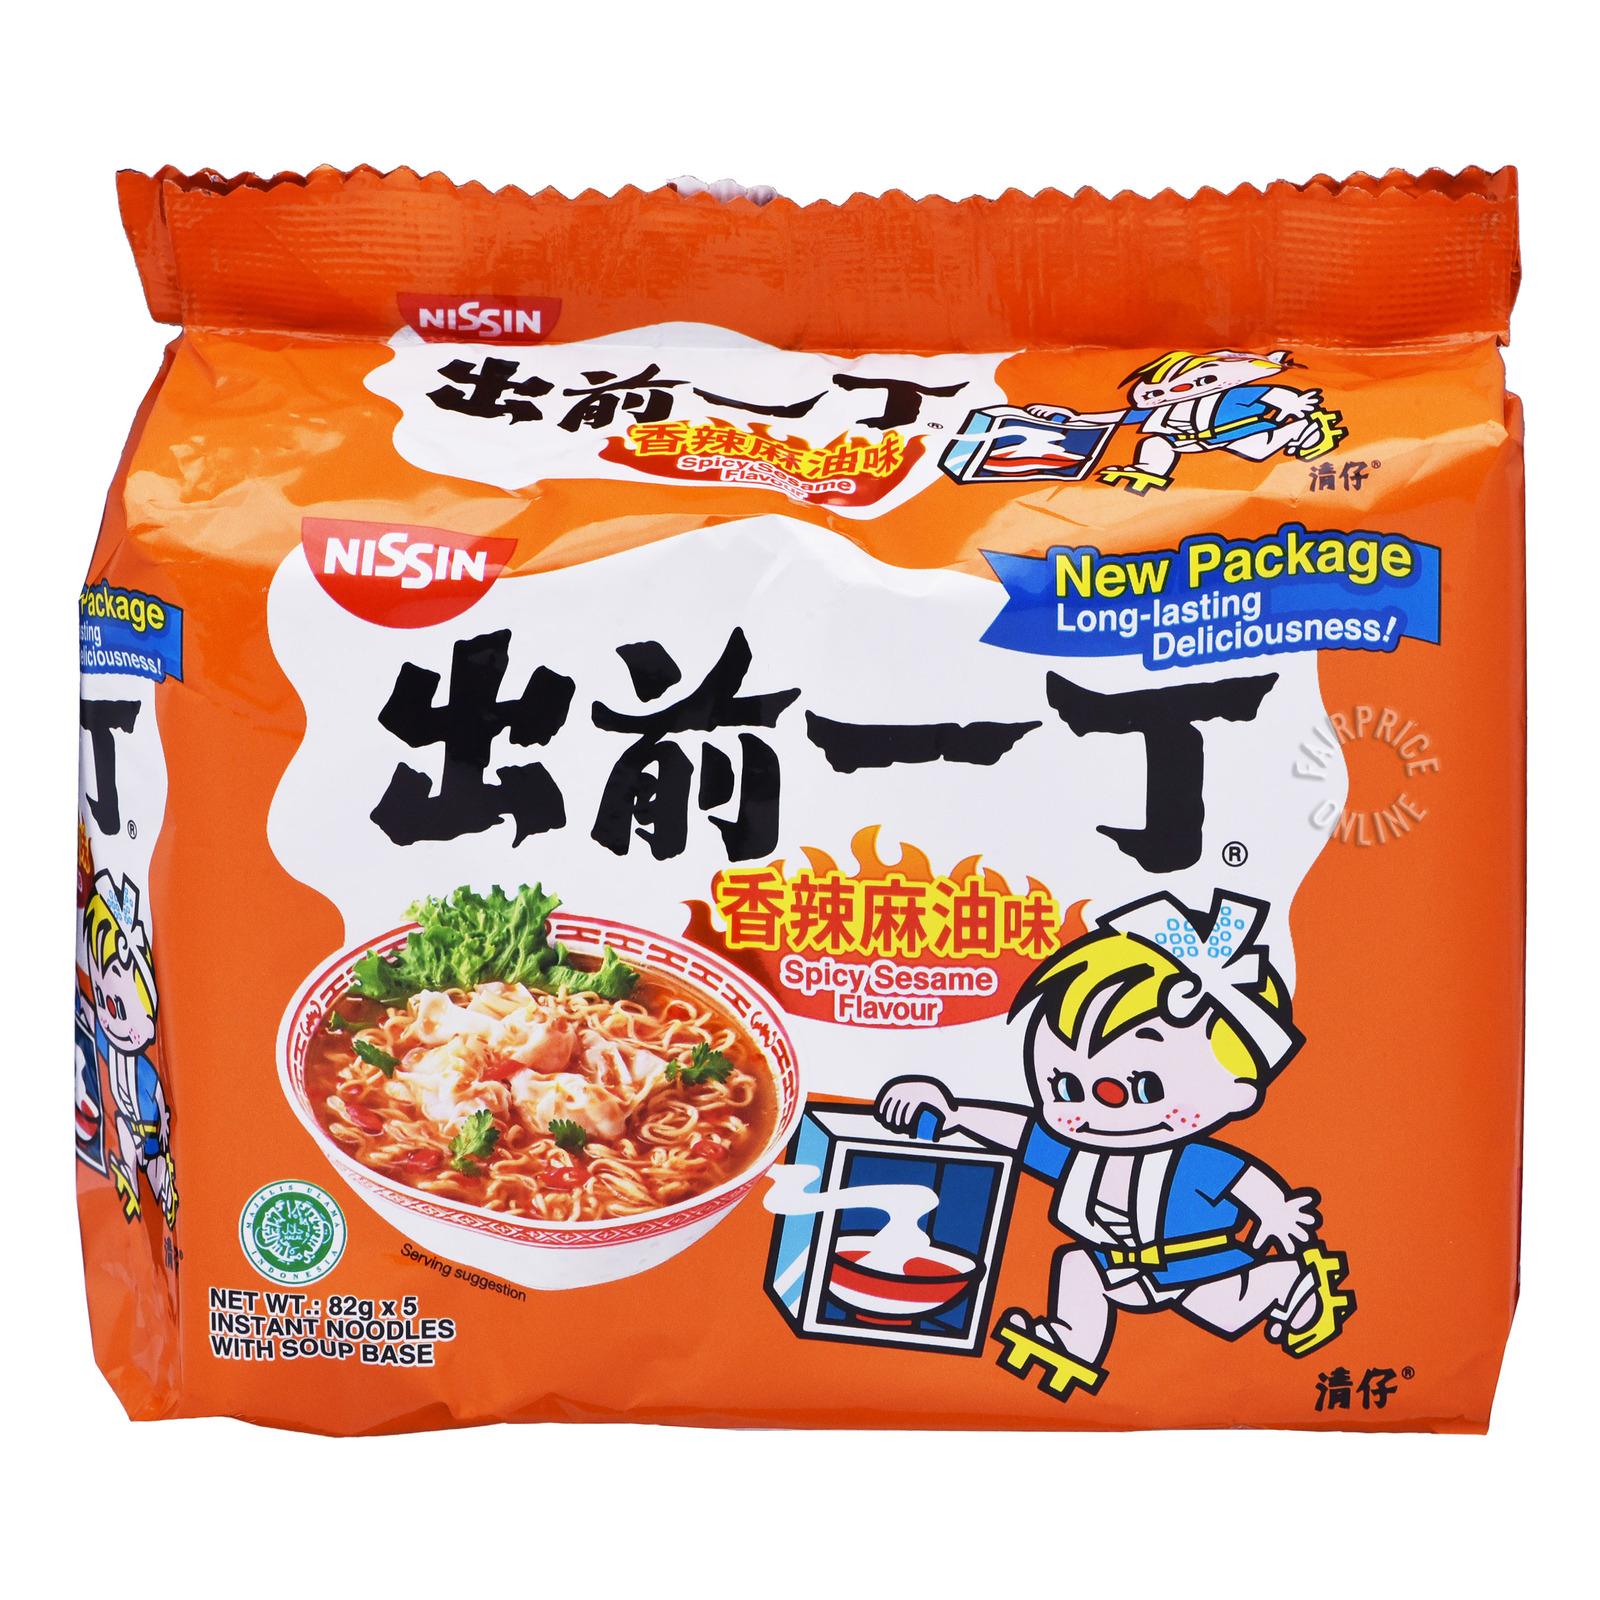 Nissin Instant Noodles - Spicy Sesame